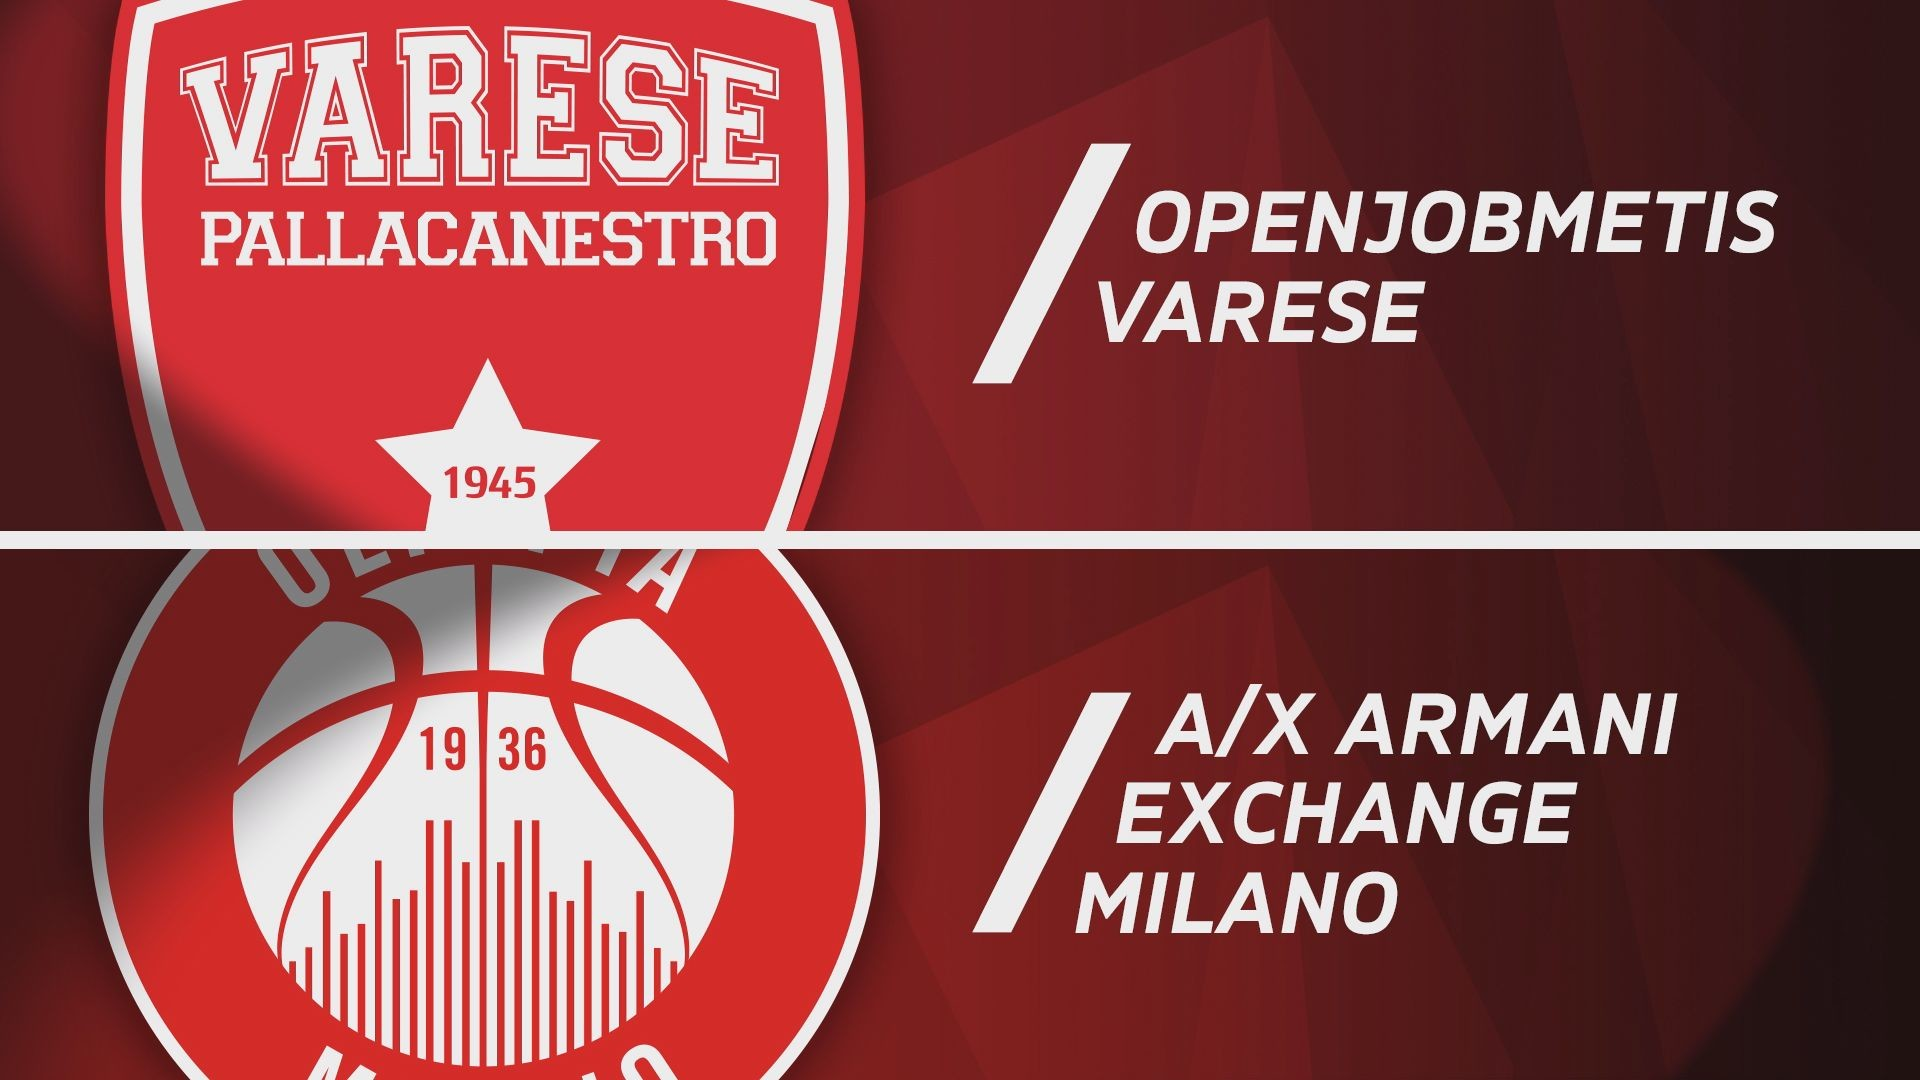 Openjobmetis Varese - A|X Armani Exchange Milano 70-96